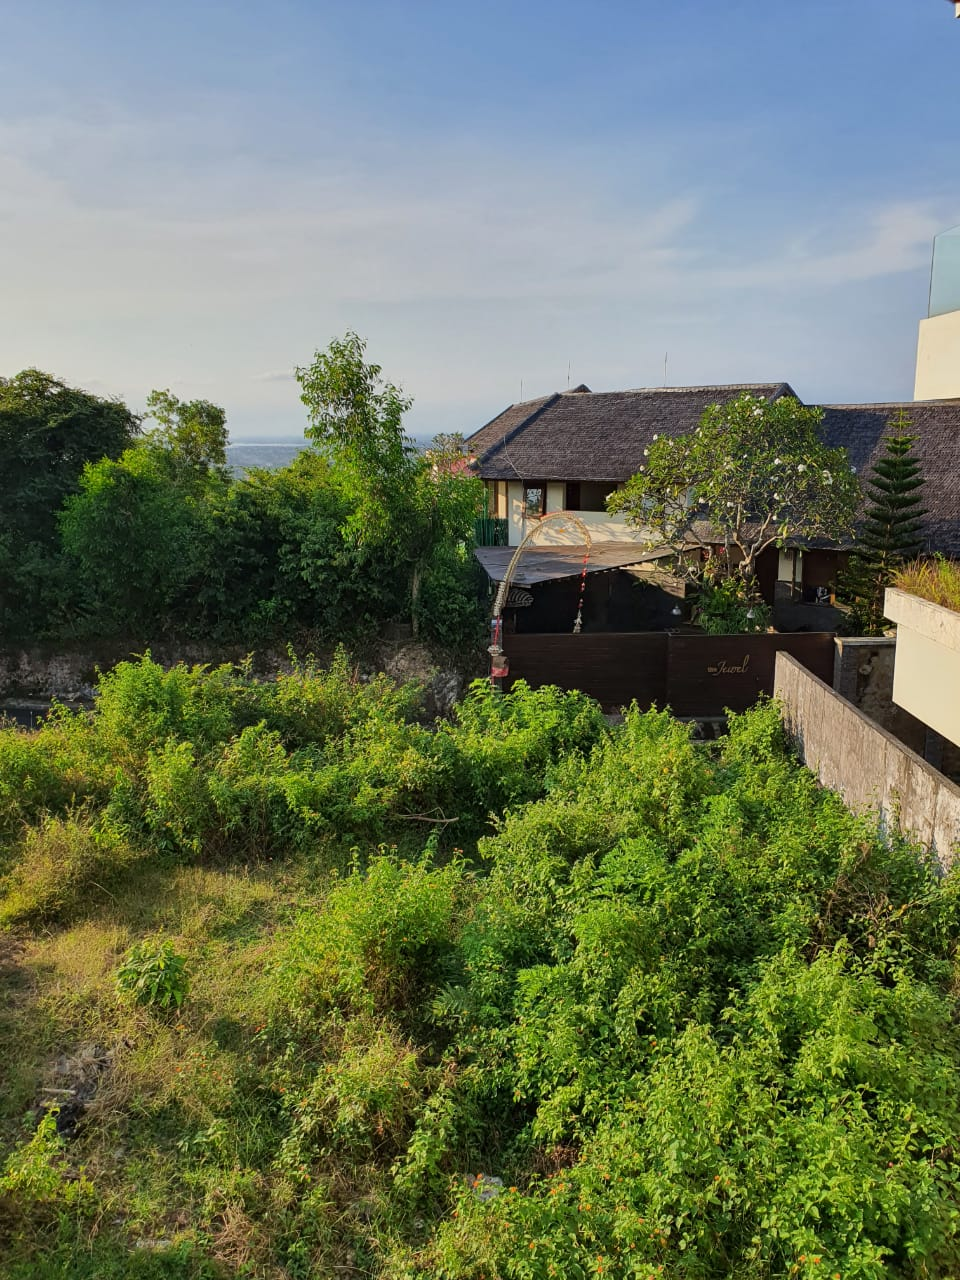 Land For sale In Tiara Nusa Jimbaran Elite Complex